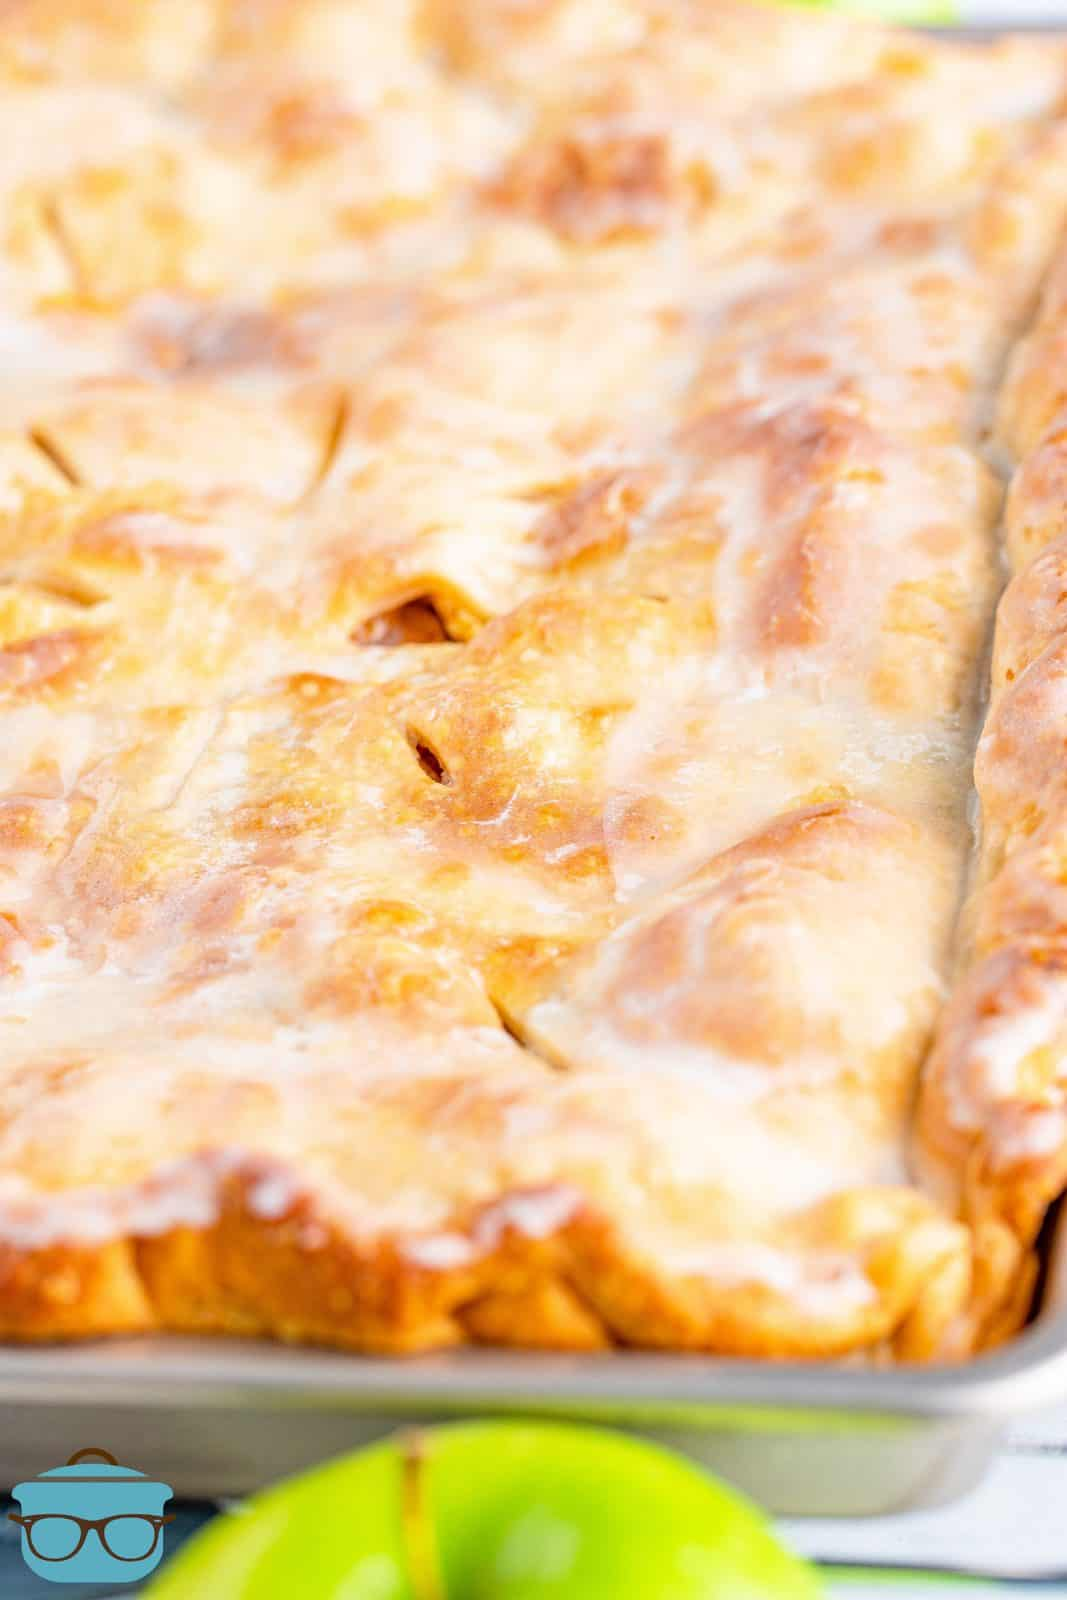 Finished glazed Apple Slab Pie in pan.